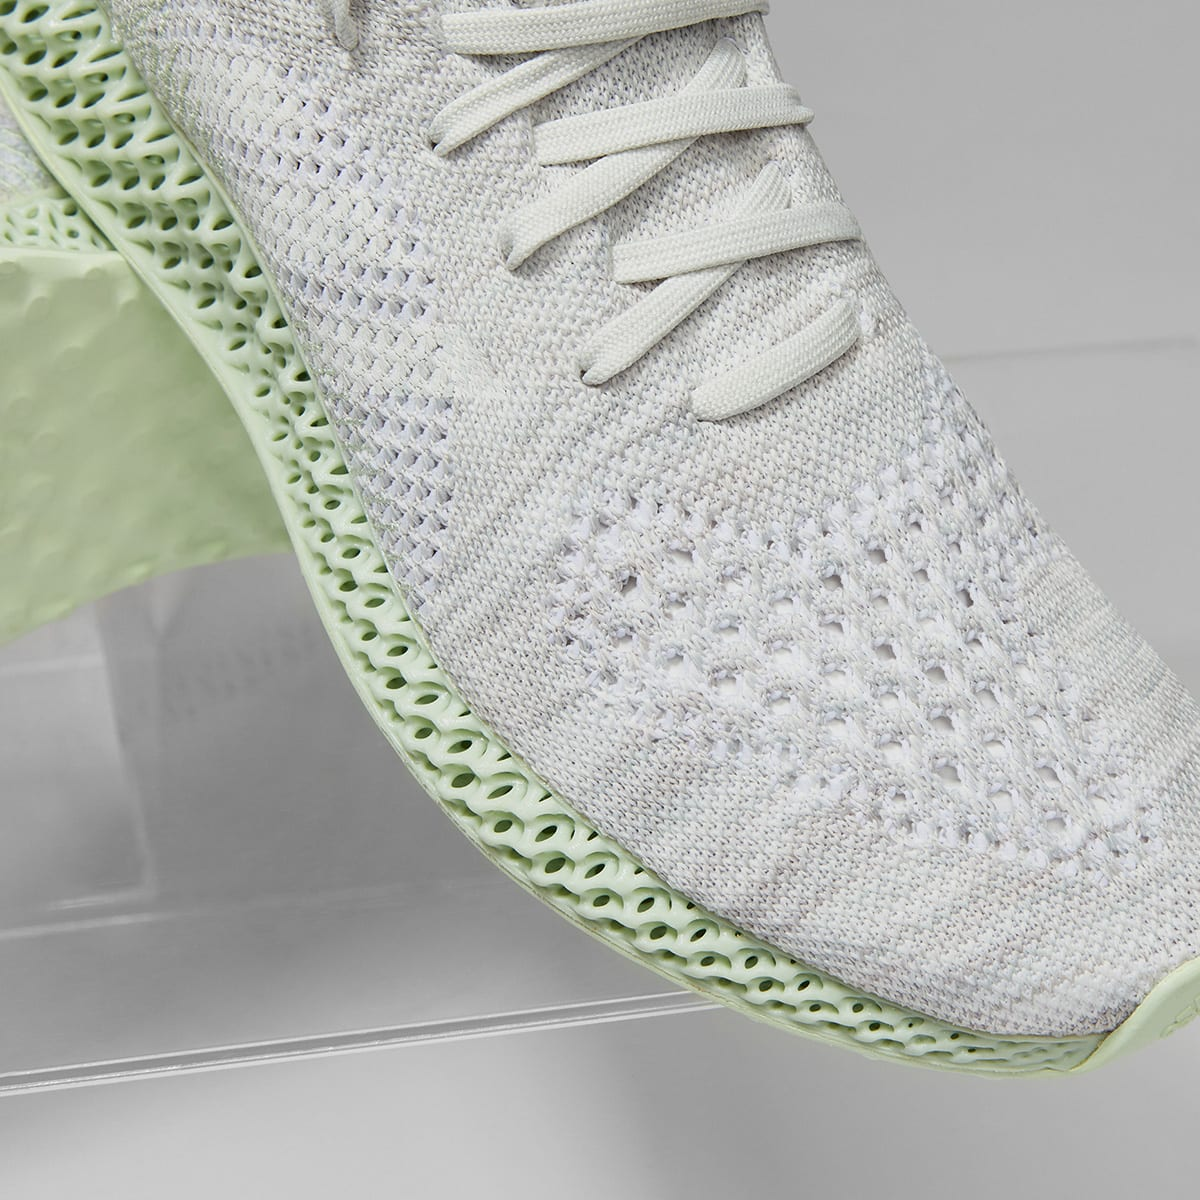 adidas Consortium Runner Mid 4D - EE4116